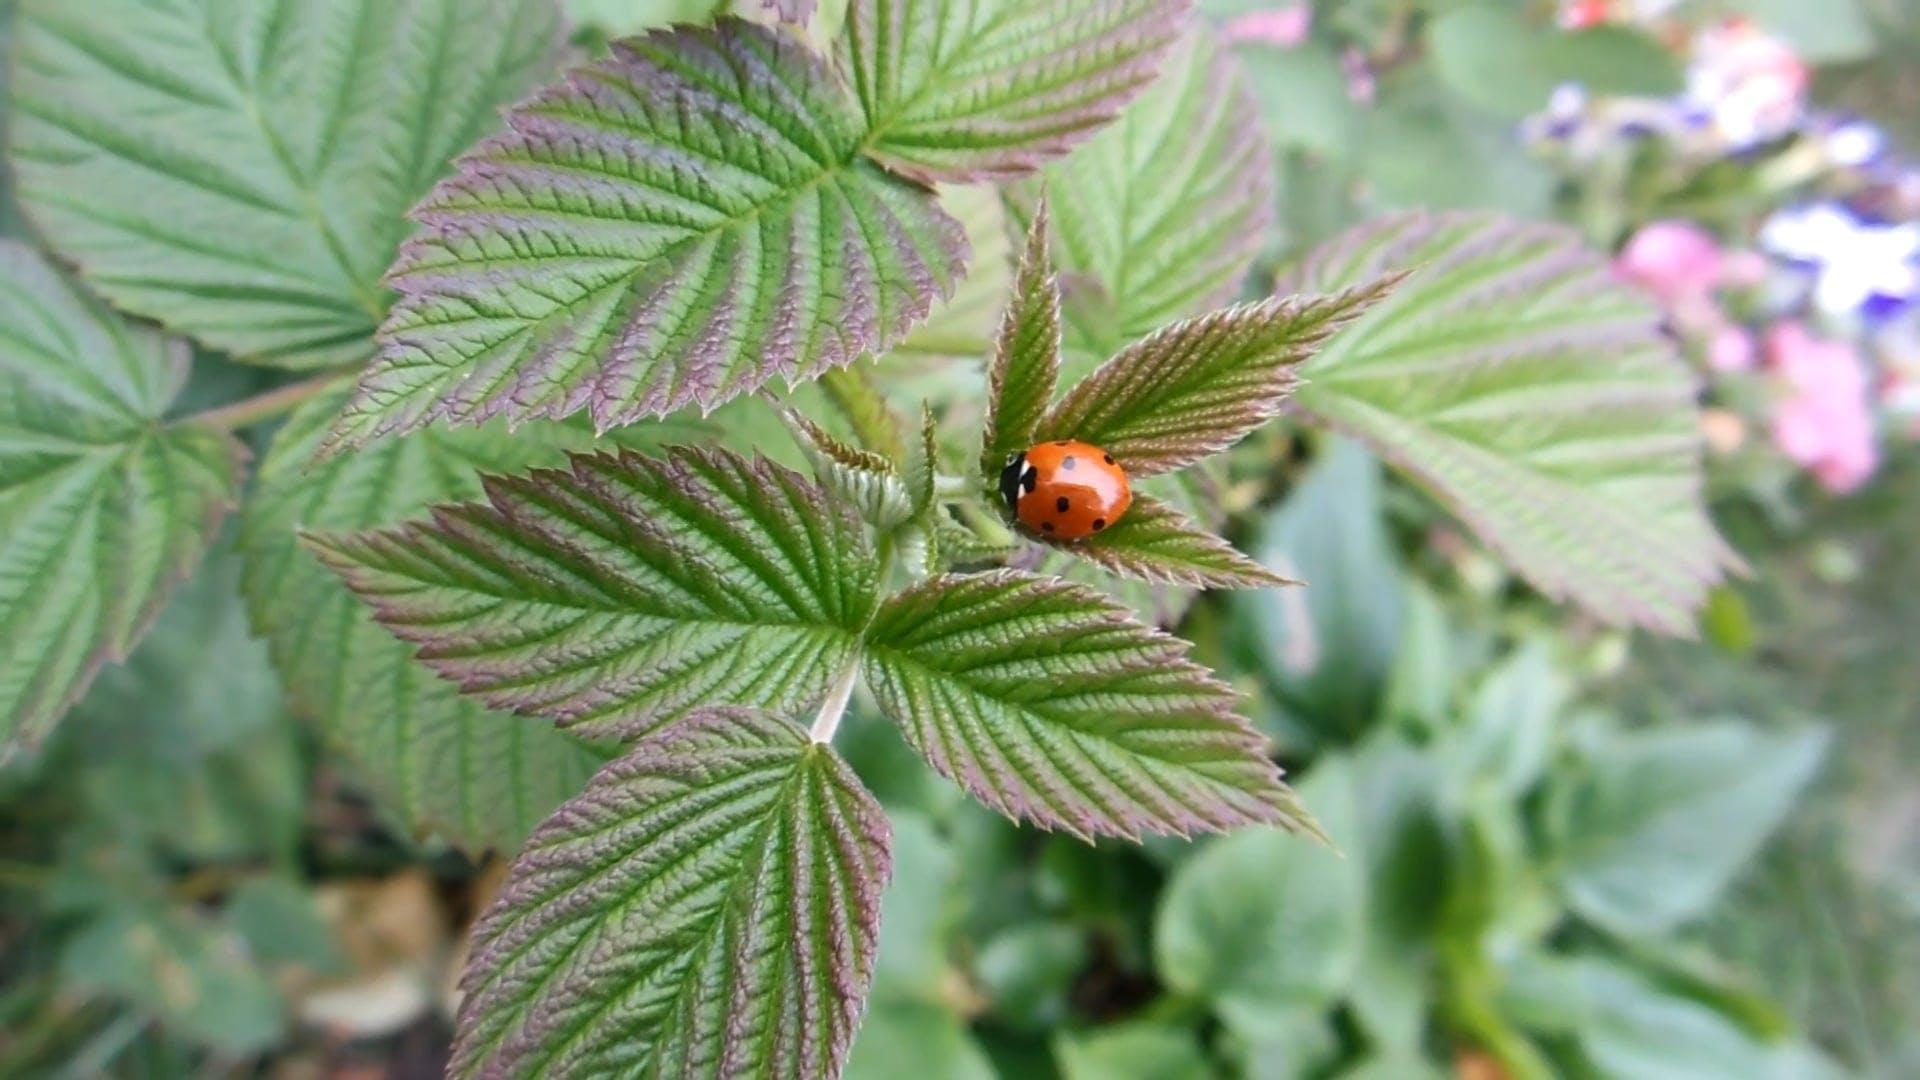 Close-Up Video of Ladybug on Leaves